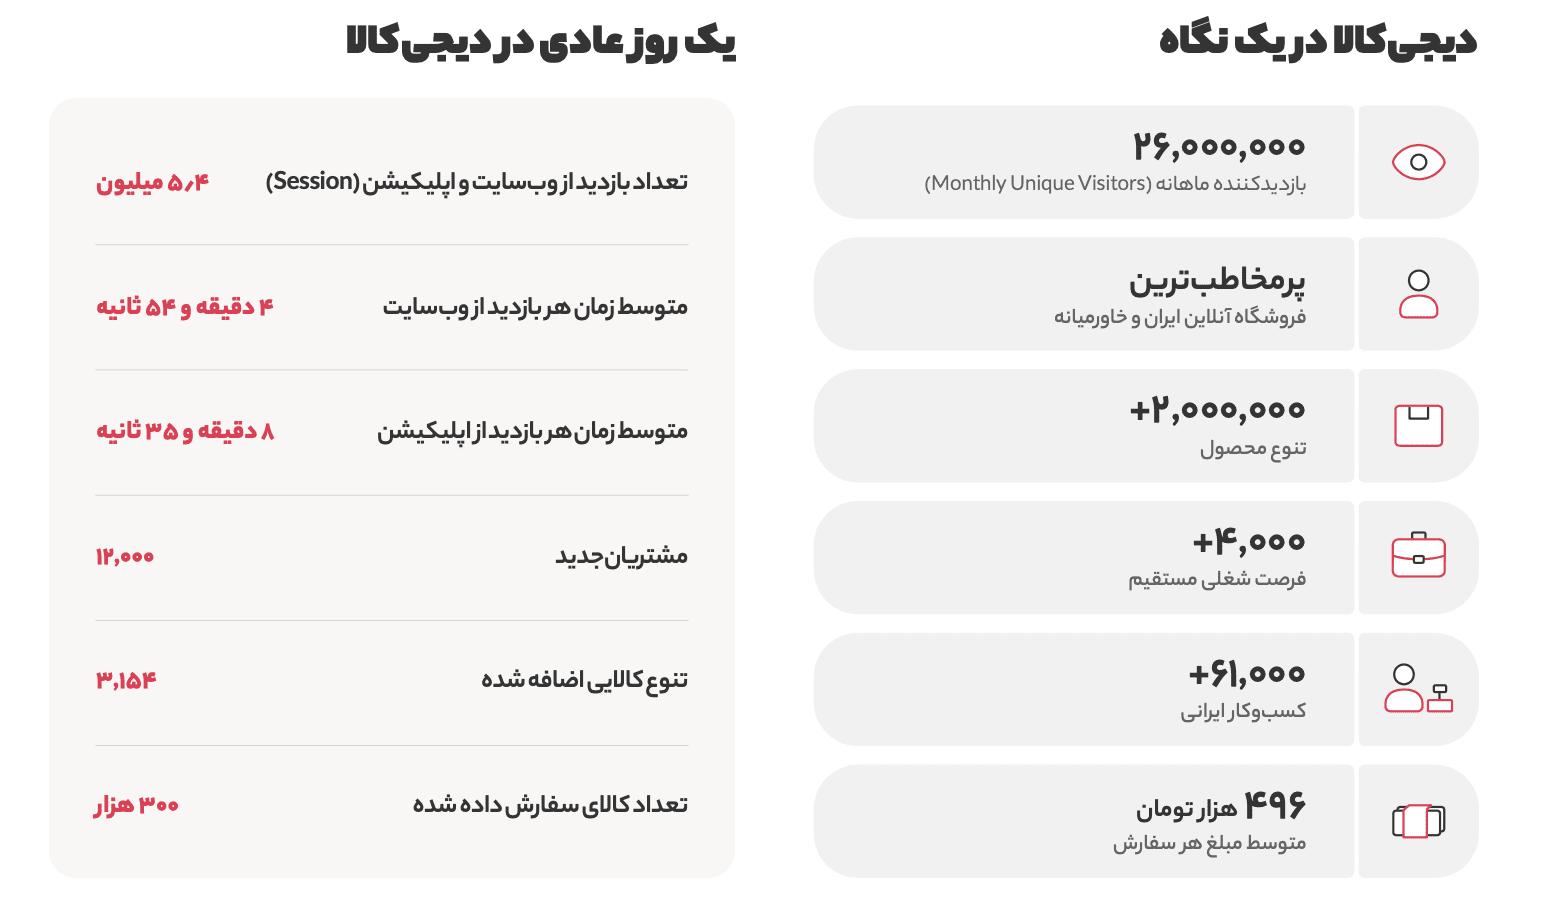 Screen Shot 1399 04 30 at 10.21.00 گزارش سال ۱۳۹۸ دیجیکالا منتشر شد؛ در بزرگترین فروشگاه آنلاین ایران چه میگذرد؟ اخبار IT